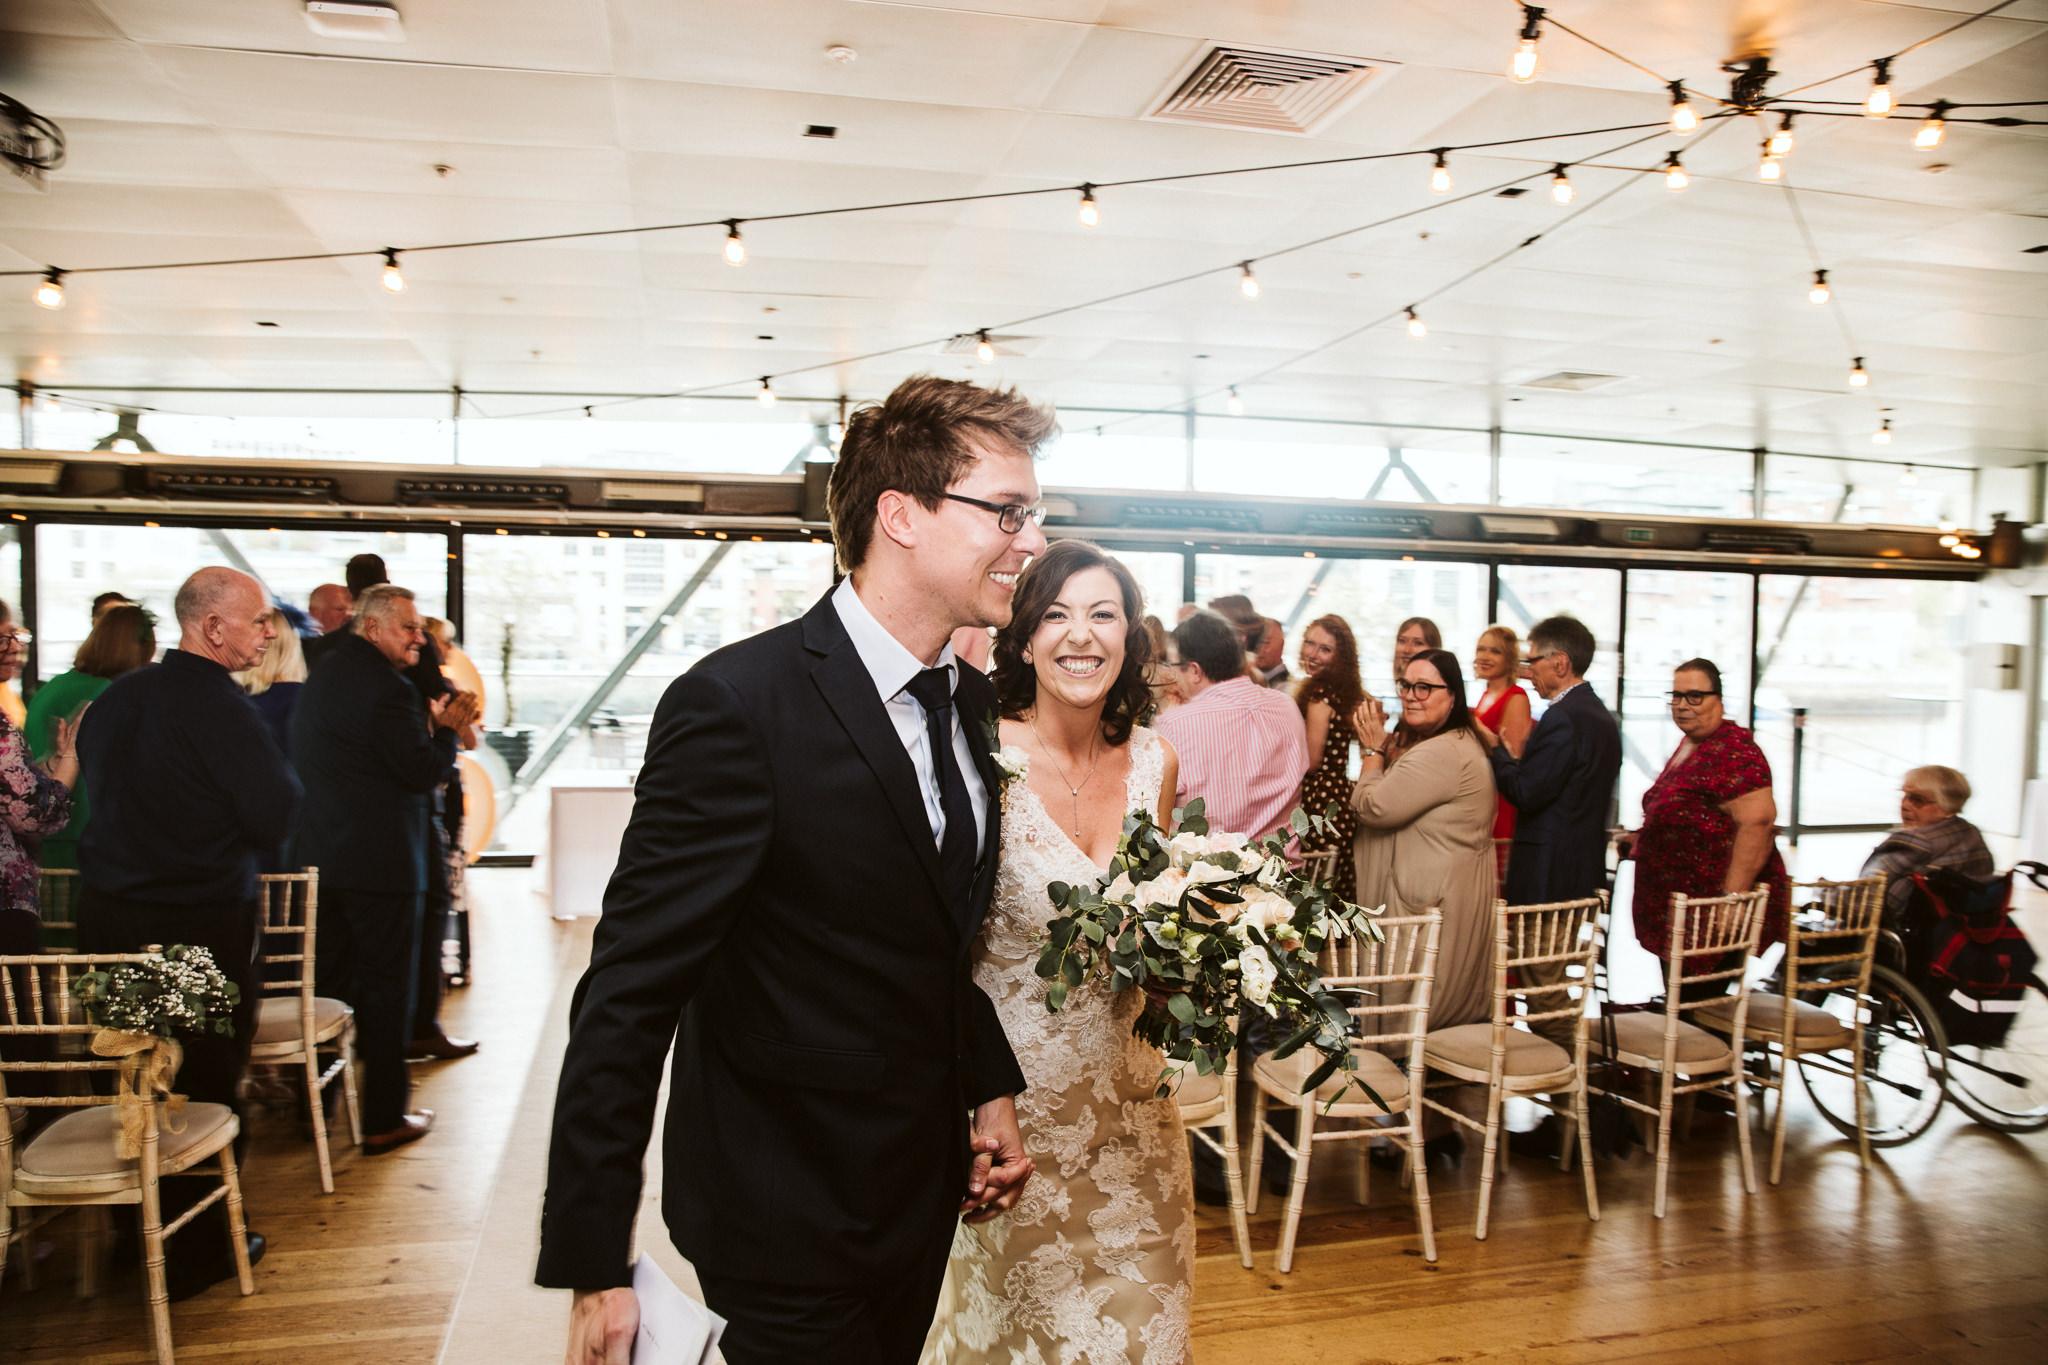 baltic-wedding-margarita-hope (30).jpg